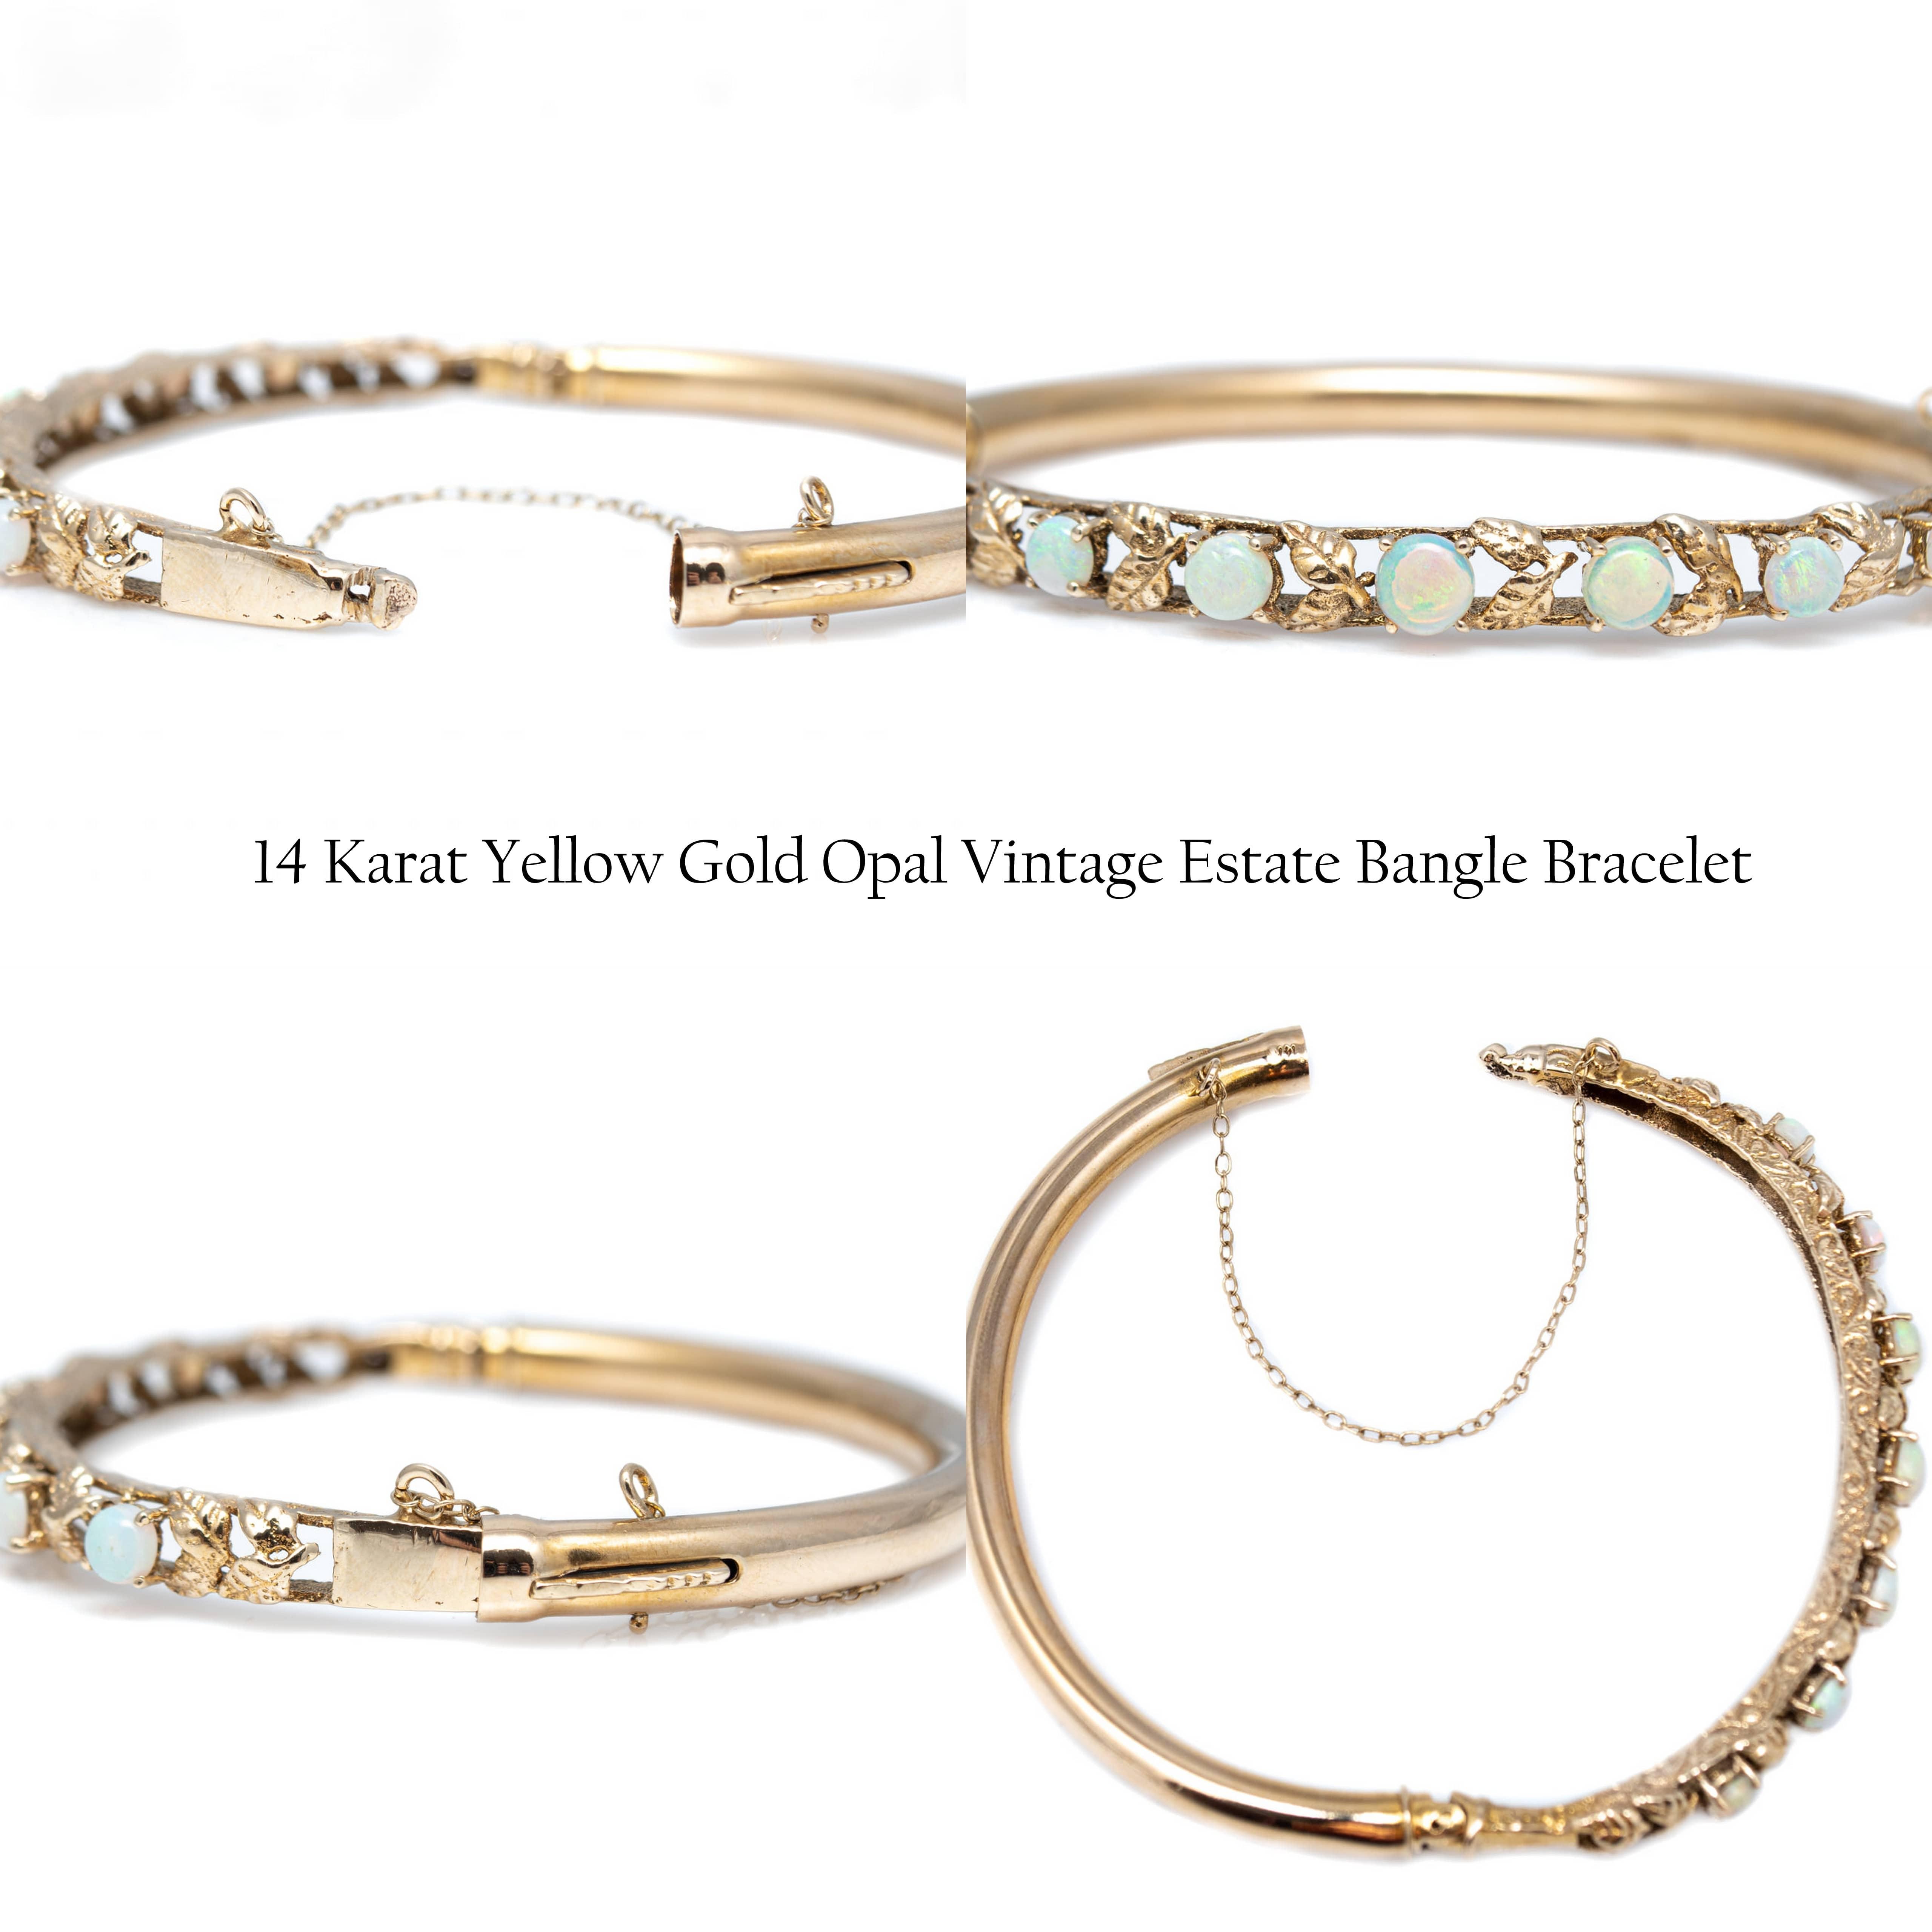 14 Karat Yellow Gold Ceylon Sapphire & D